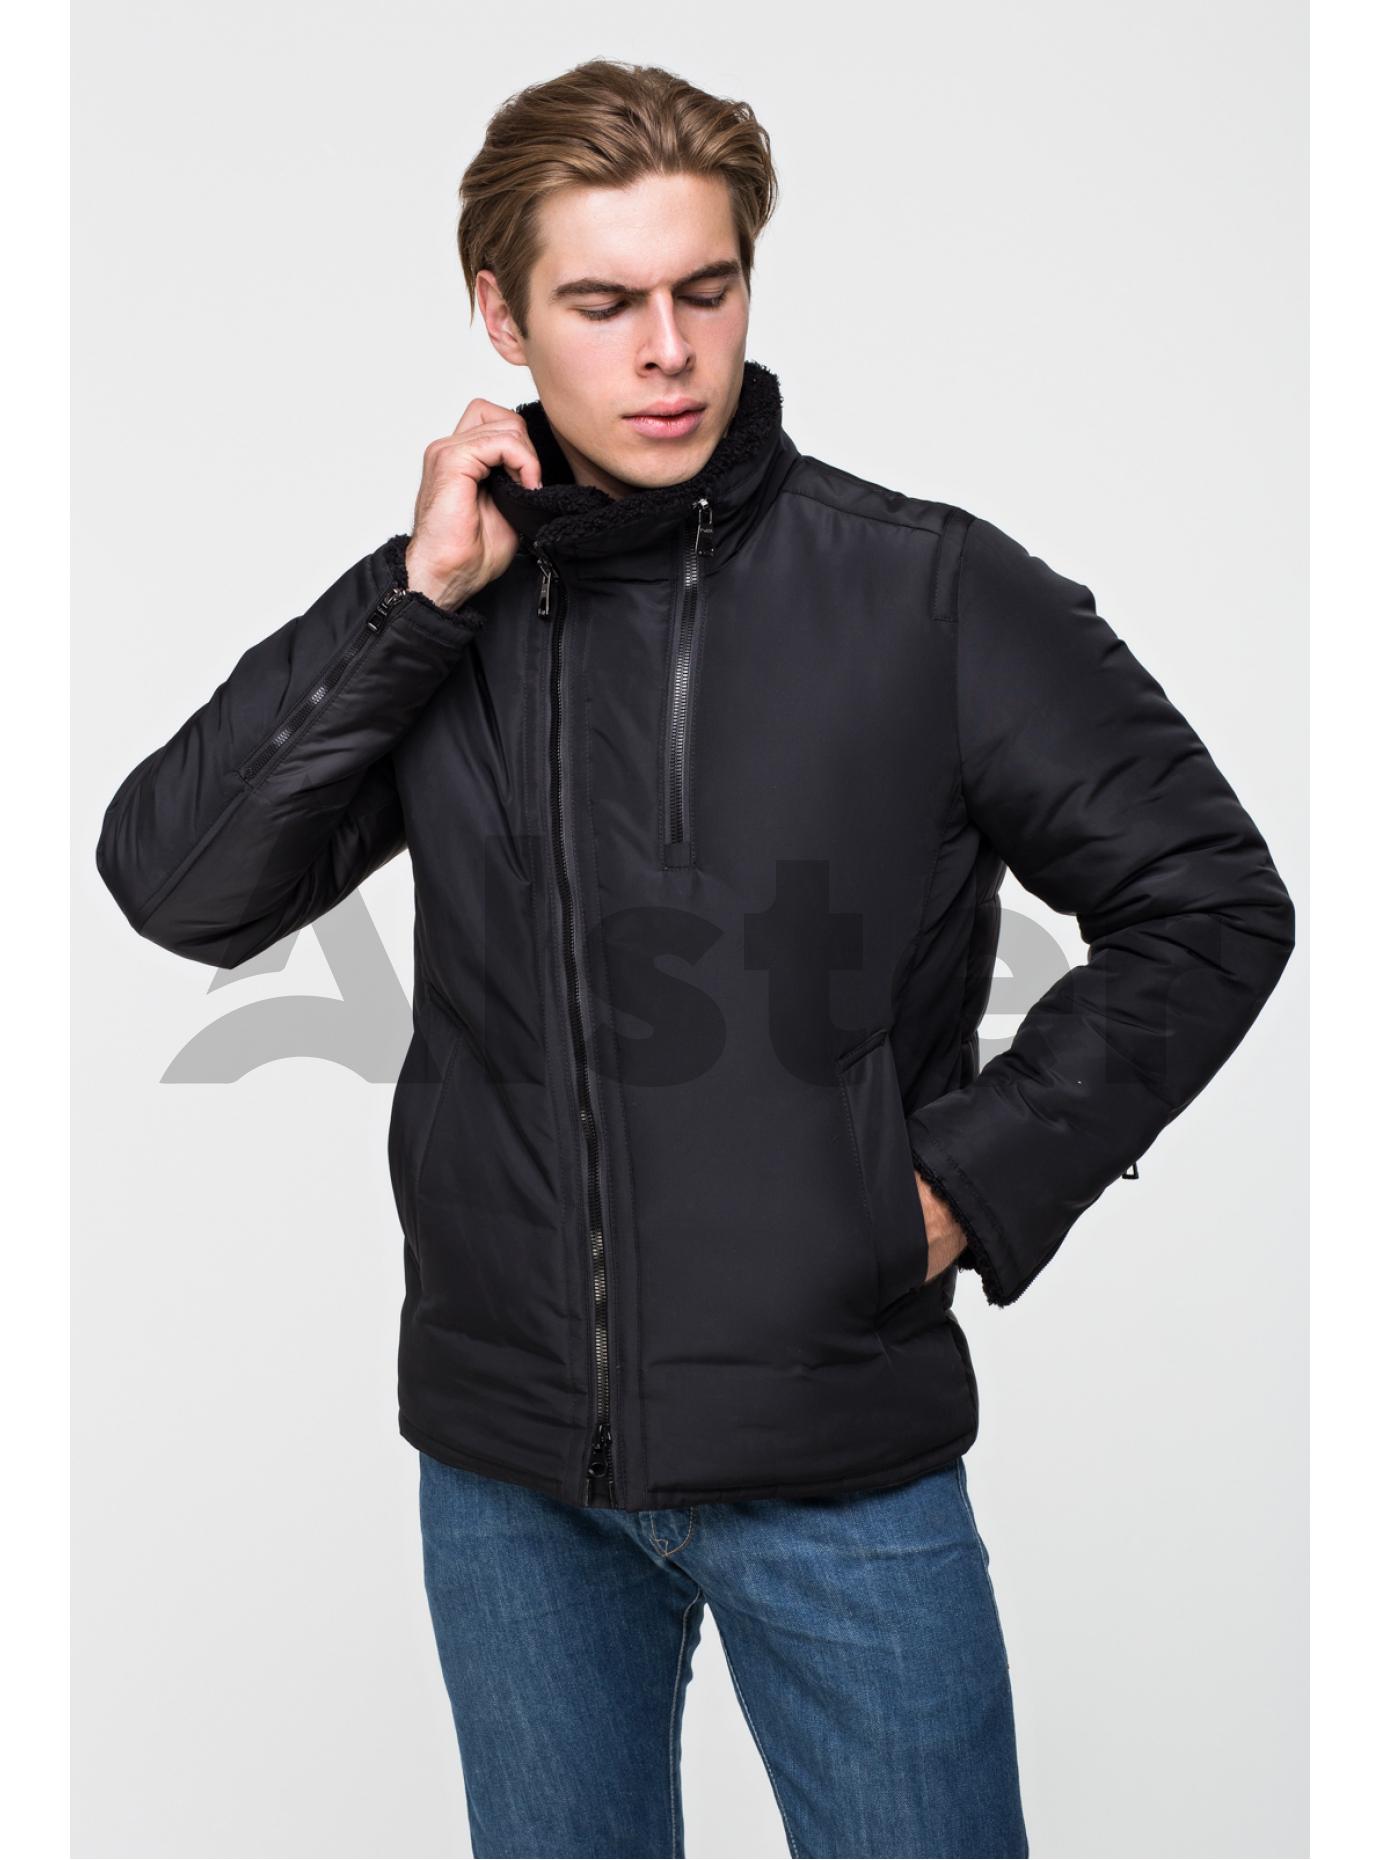 Куртка чоловіча зимова на блискавці Т-275 Чорний 46 (02-MT21066): фото - Alster.ua